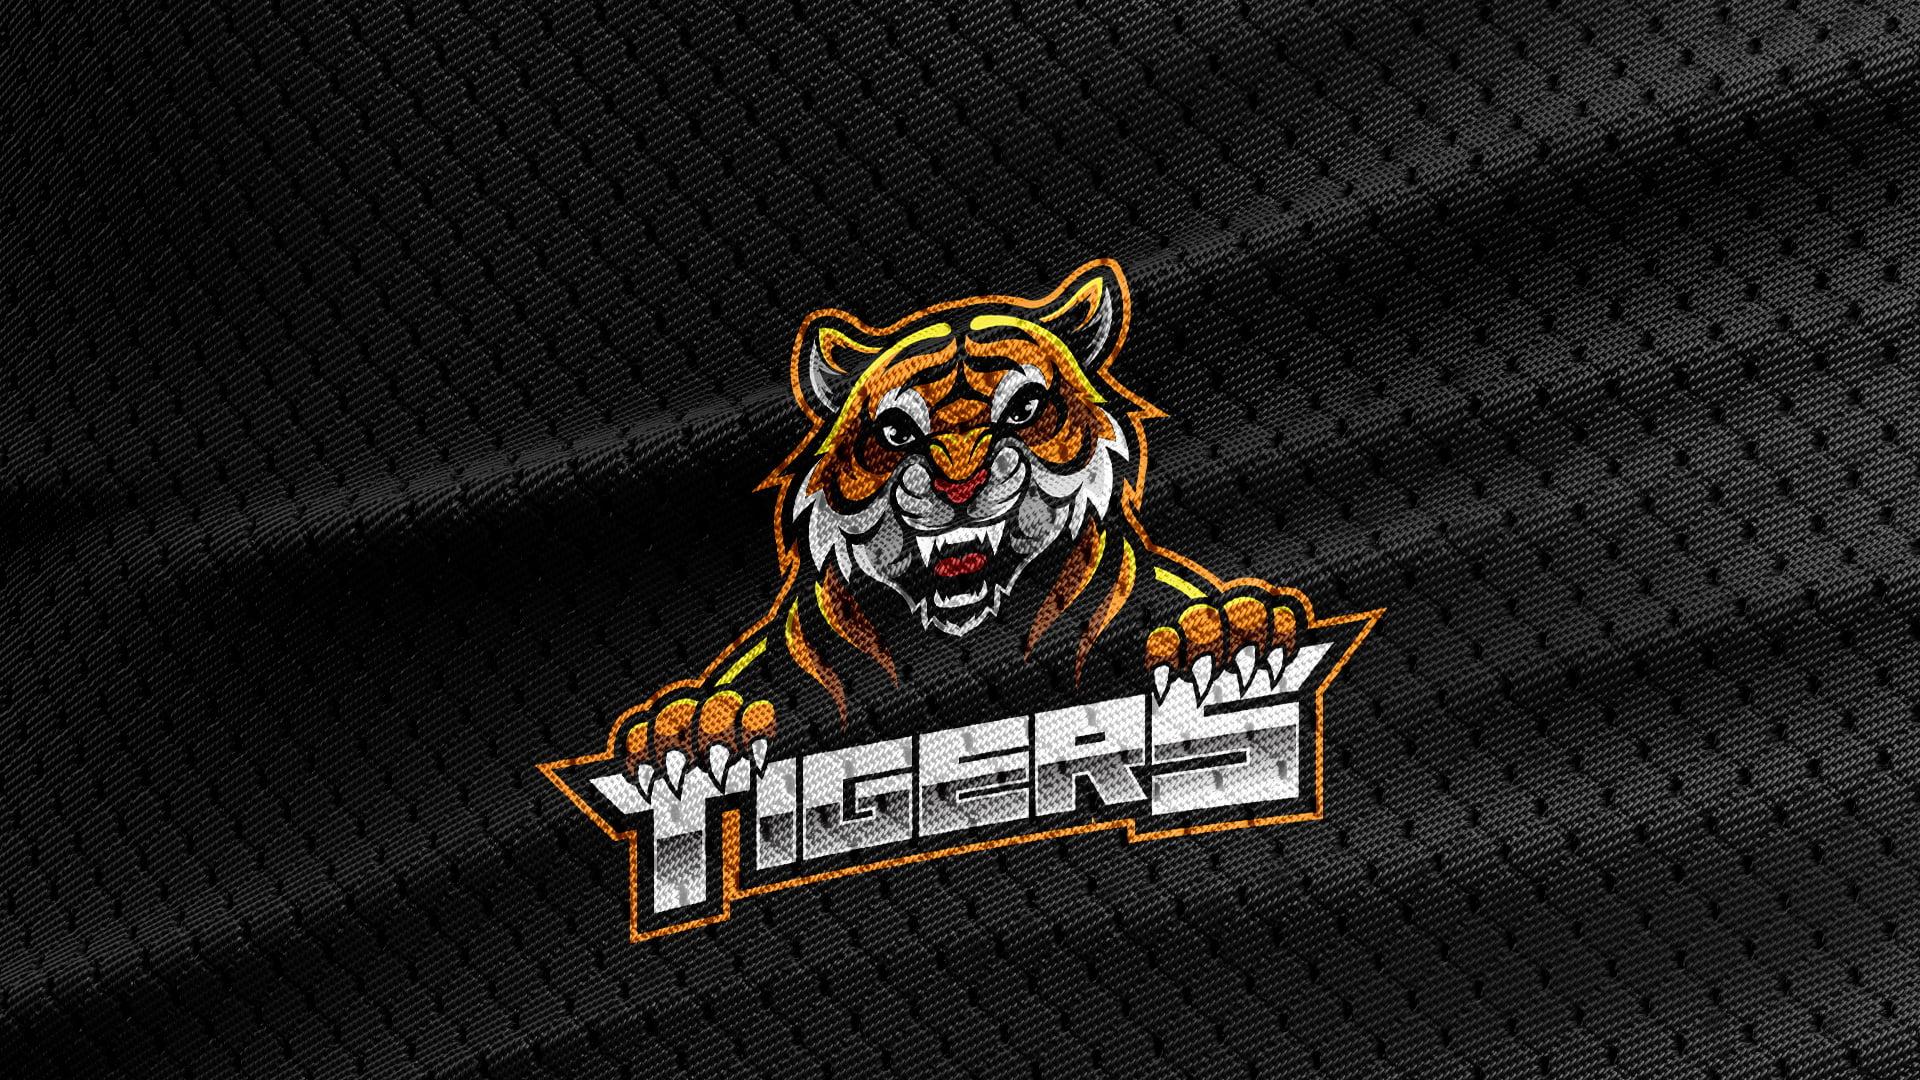 Black-Jersey-Texture-Free-Download-Tiger-Logo-Mascot